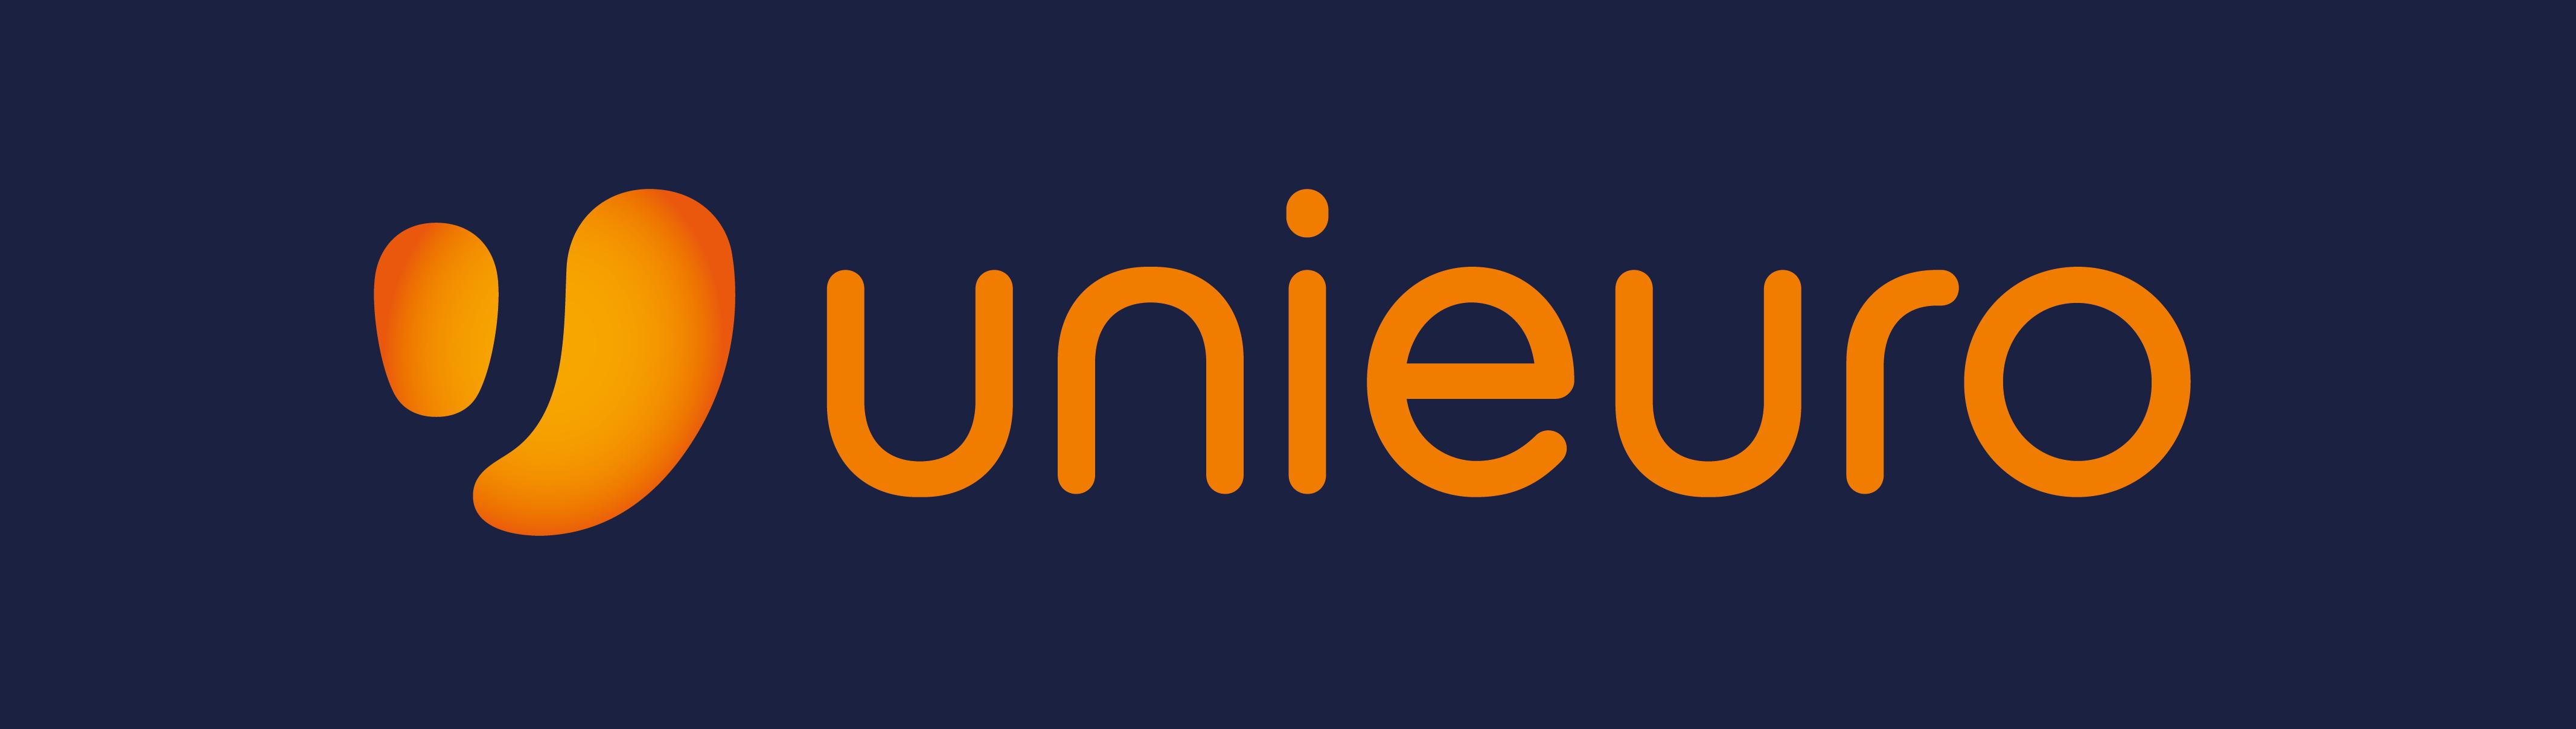 unieuro-1024x290